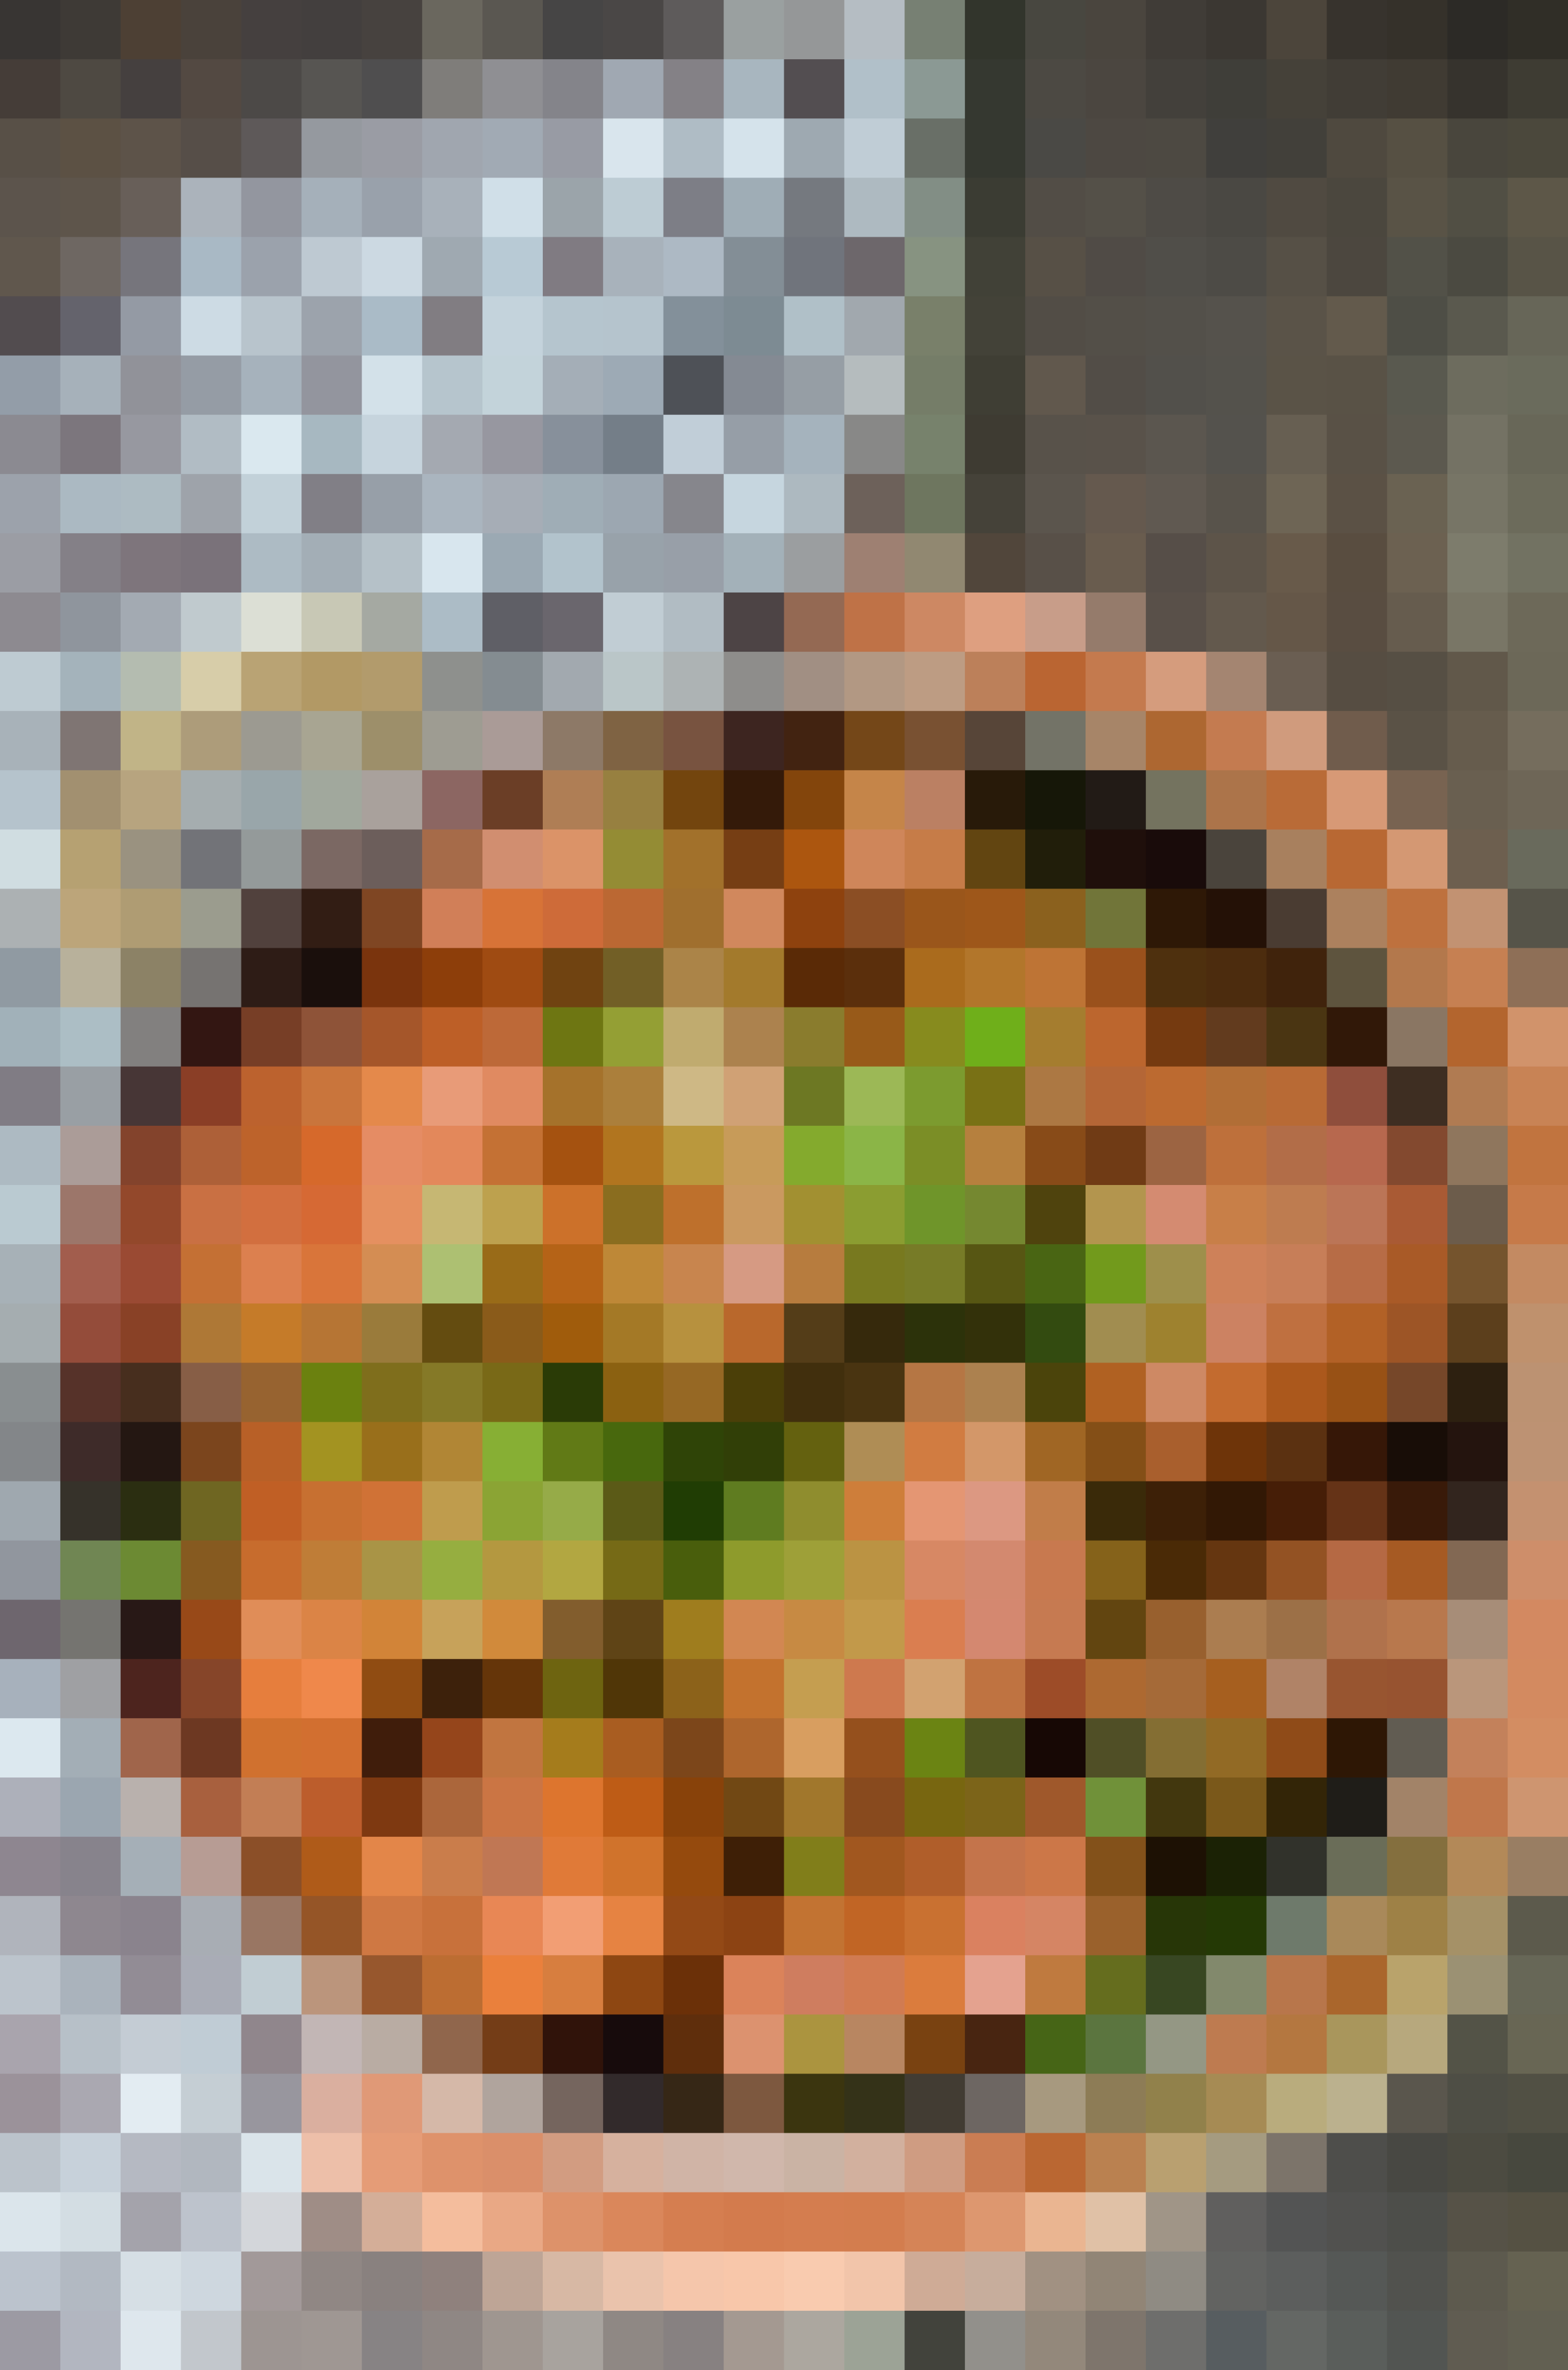 Pumpkin Pie in a Mug, Pull-Apart Cheese Bread, Red Lentil Soup, Lamb Rogan Josh & Pretzel Cinnamon Rolls: gallery image 7